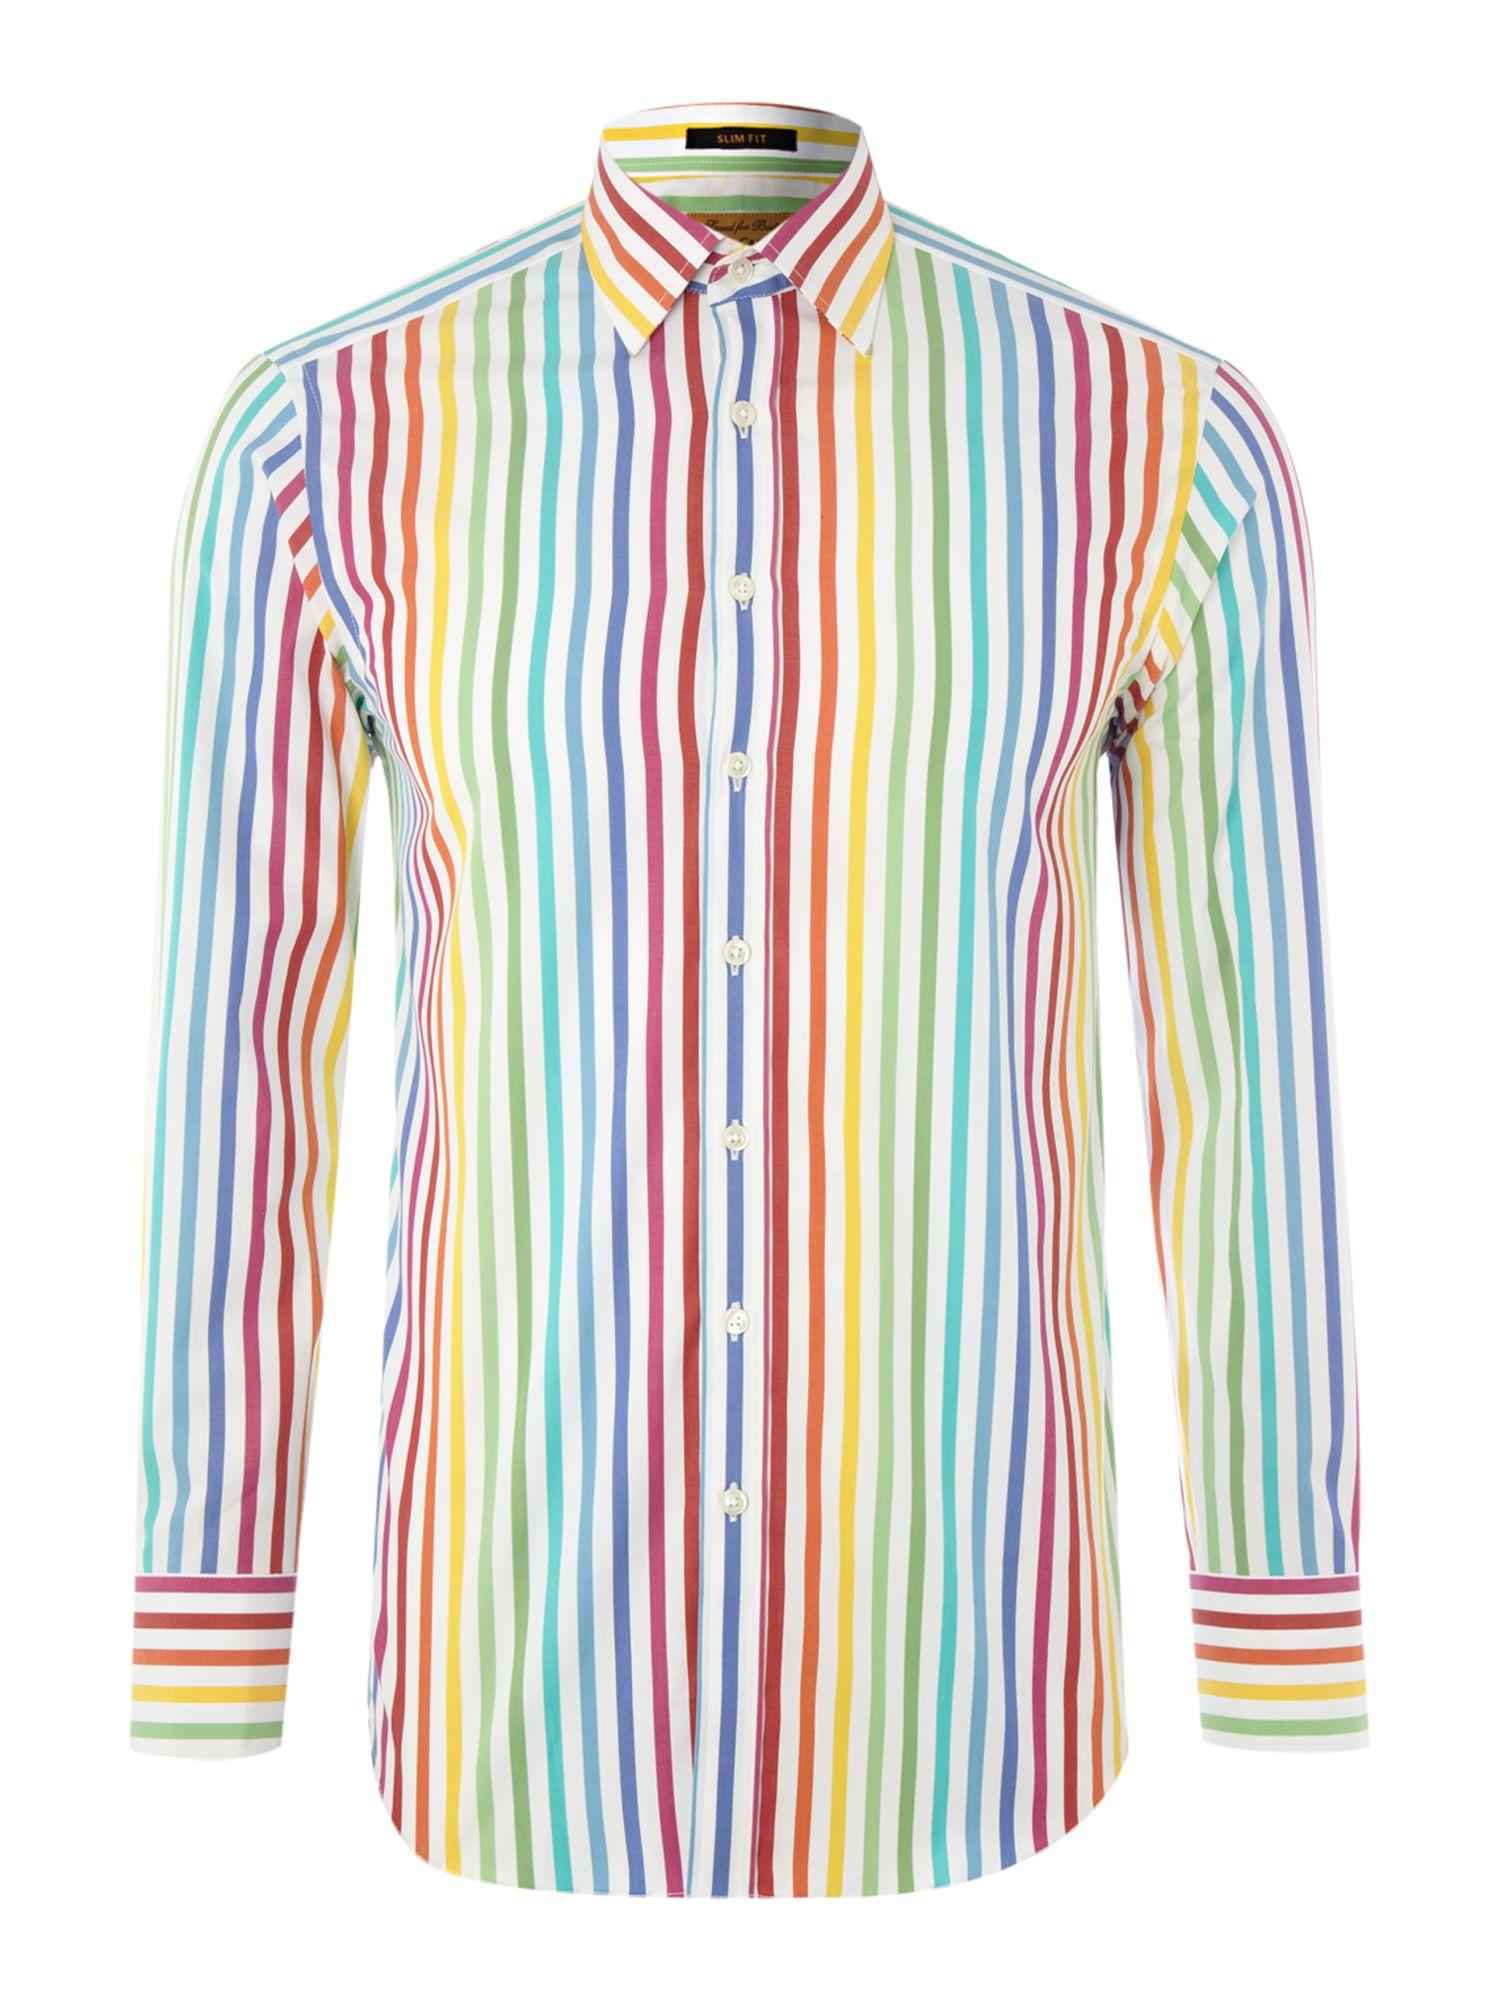 Simon Carter Long Sleeved Color Stripe Shirt In Multicolor